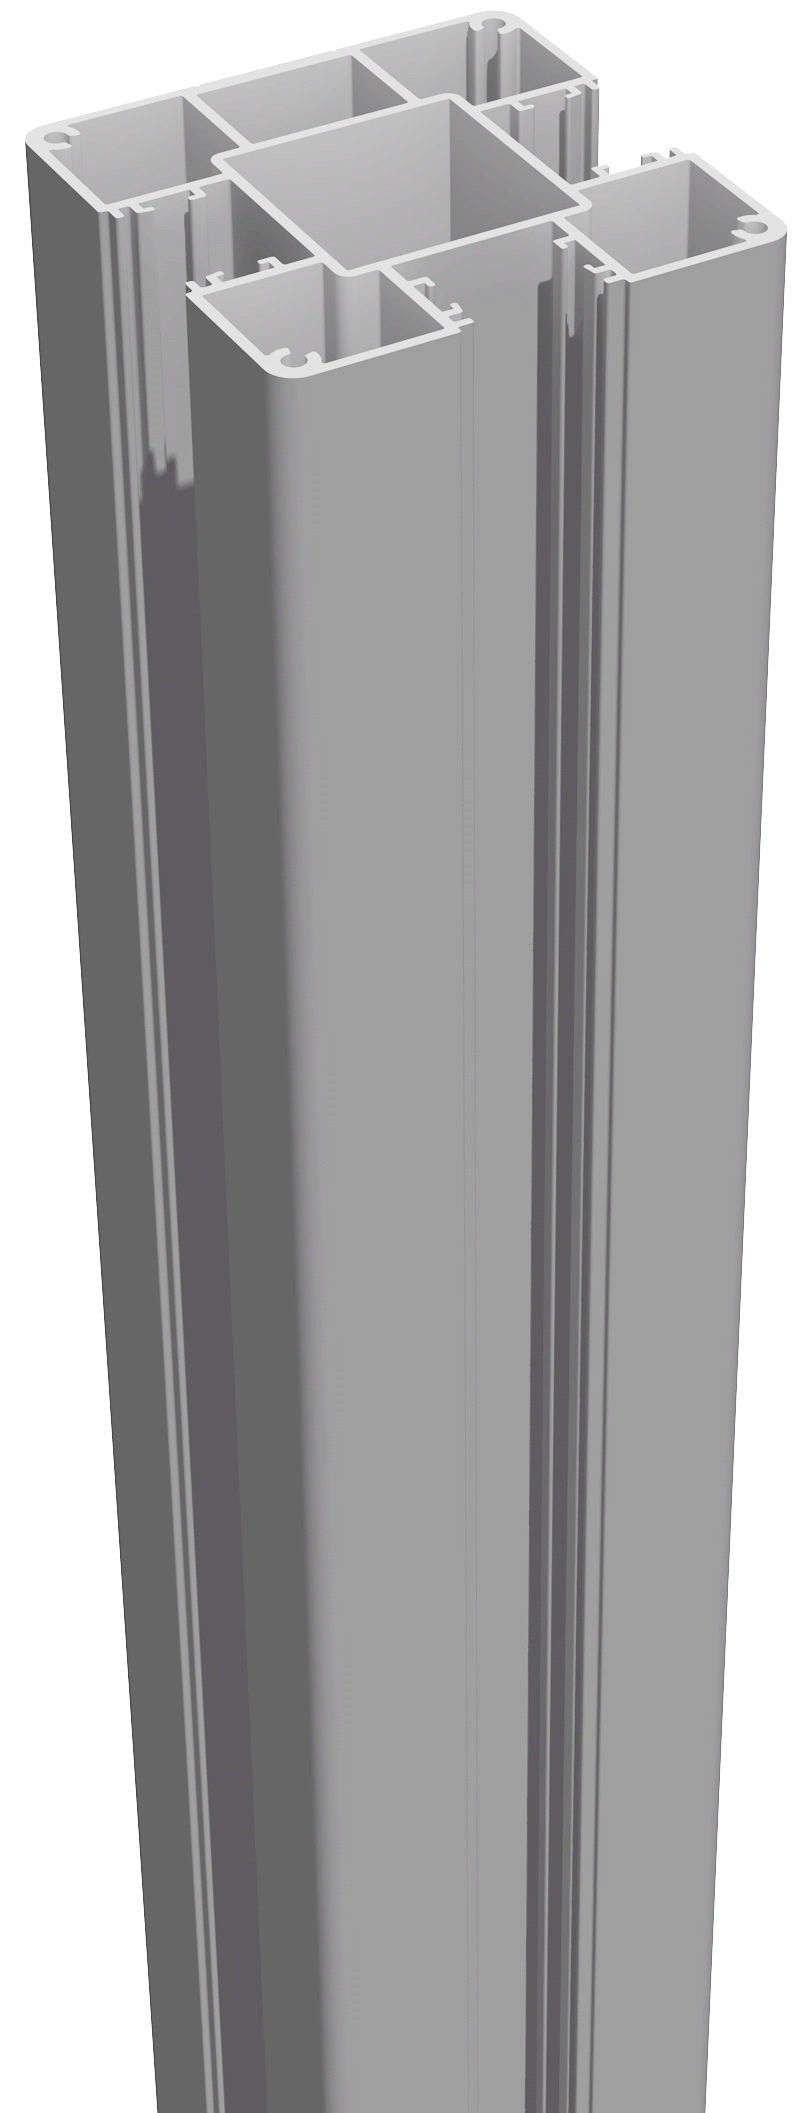 GrojaLumino Alu Stecksystem Pfosten zum Einbetonieren 240